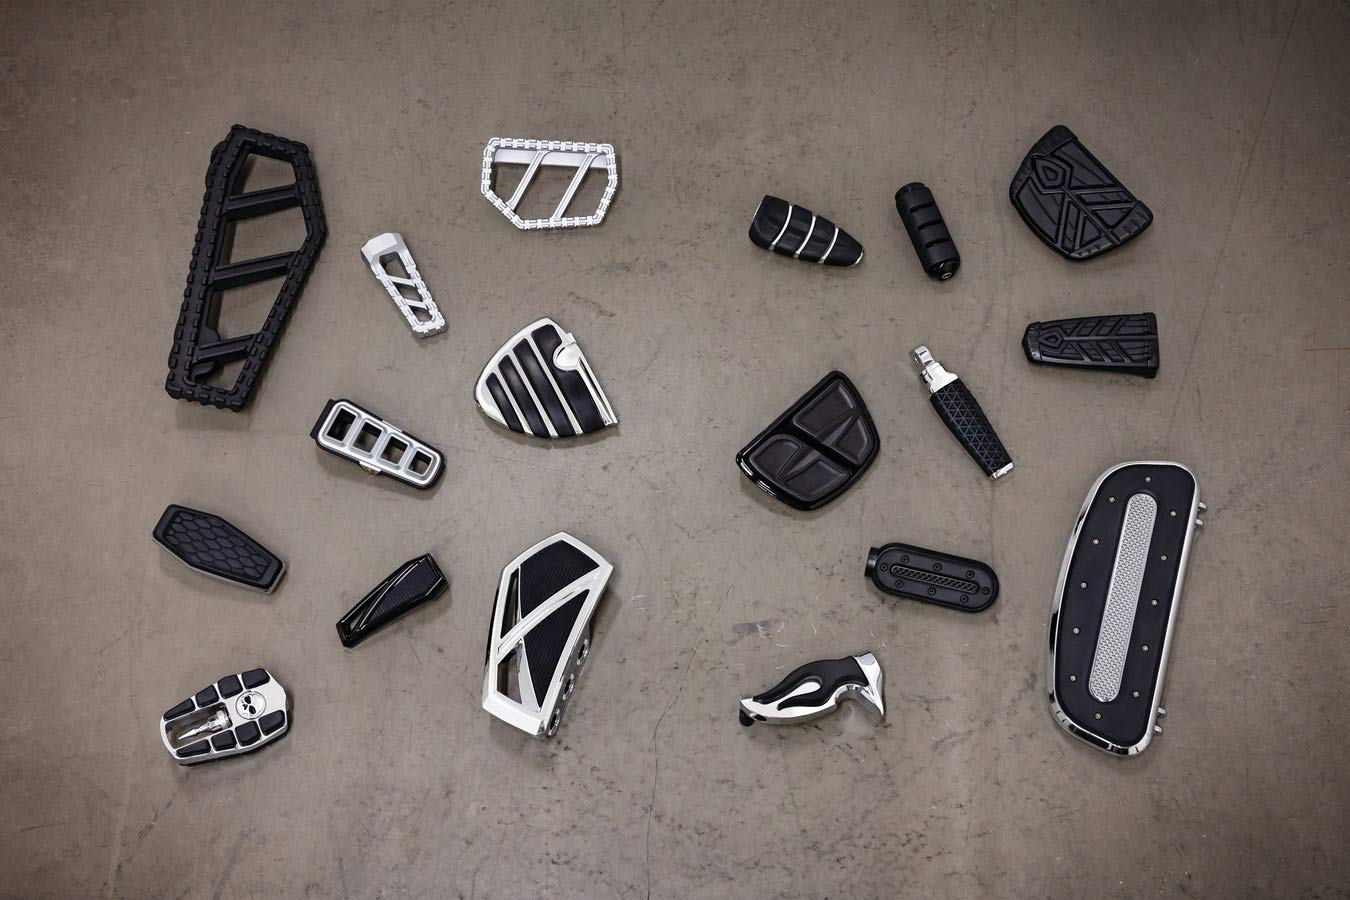 1 Pair Satin Black Kuryakyn 5653 Motorcycle Foot Control Component Spear Mini Board Floorboards